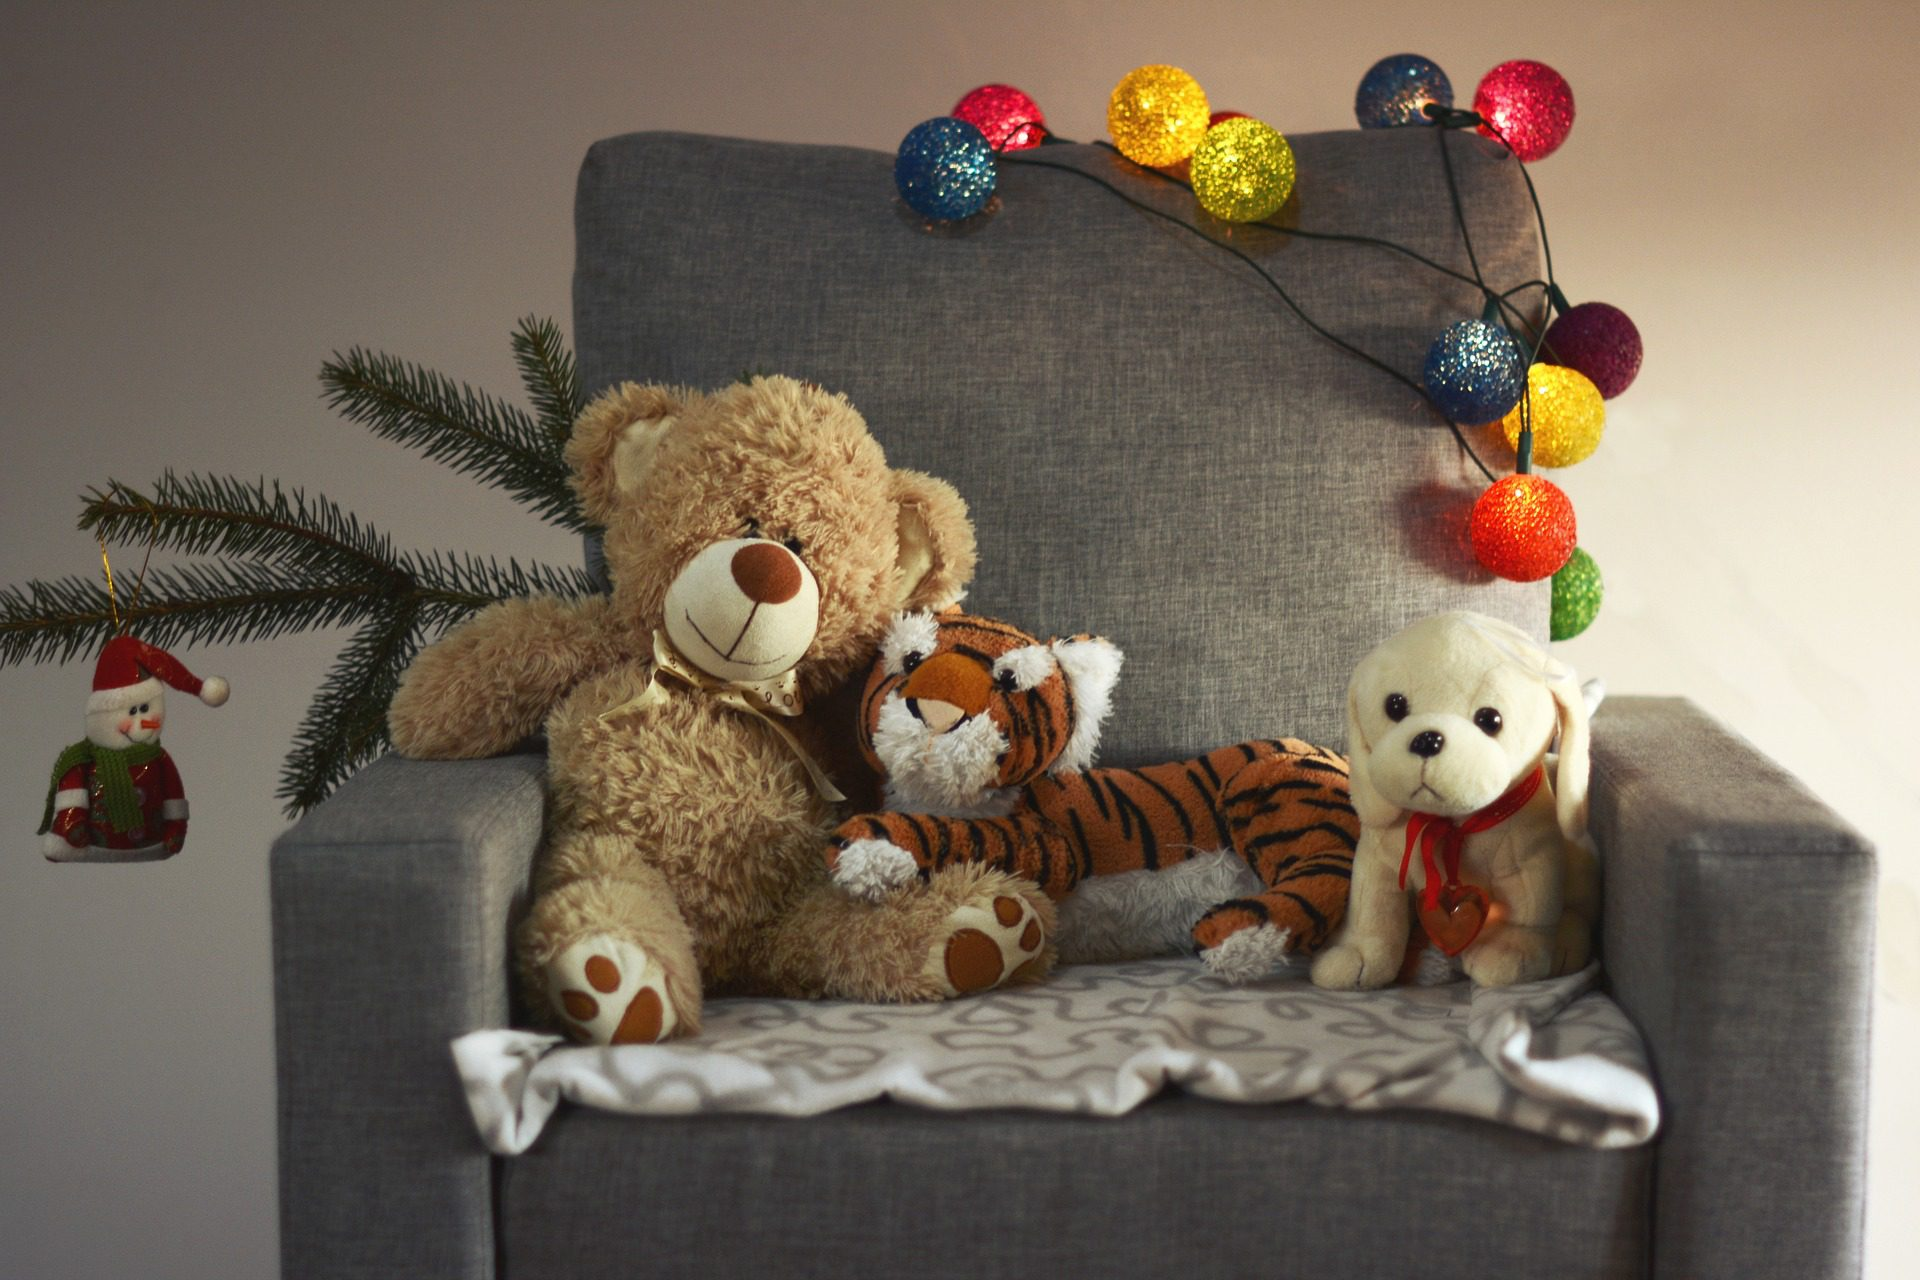 Armchair Family Adventures to Entertain Your Children